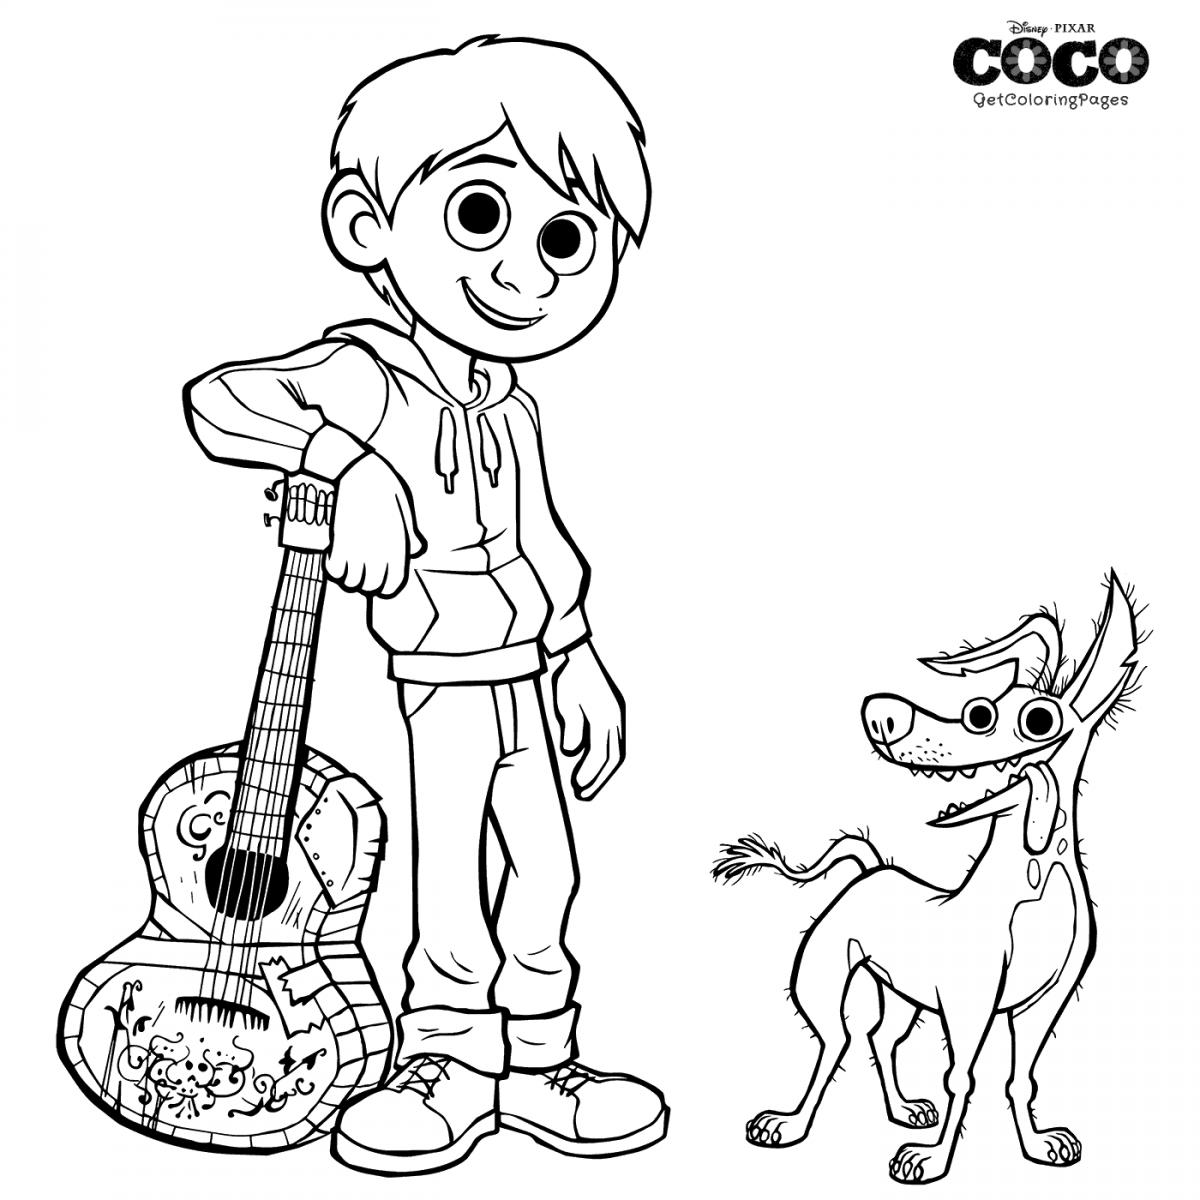 Dante And Miguel Coco Coloring Page